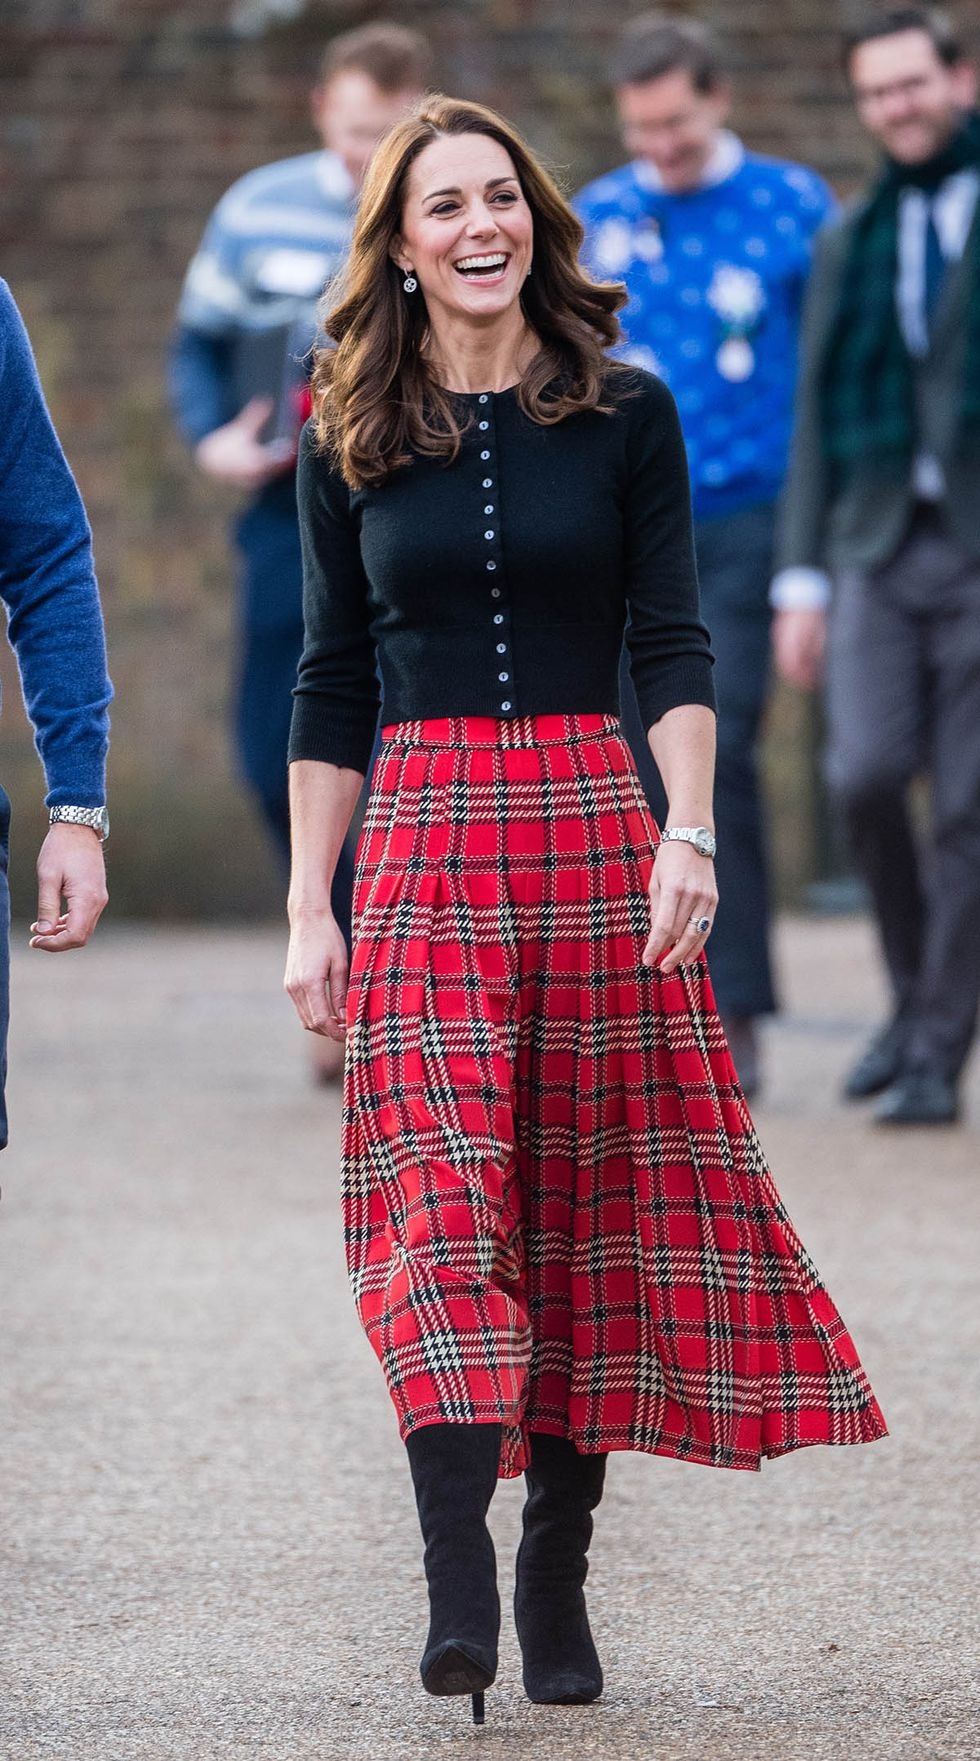 a5e85f5069ebc 英国王室絶対アイコン、キャサリン妃の2018年スタイルを振り返る ...